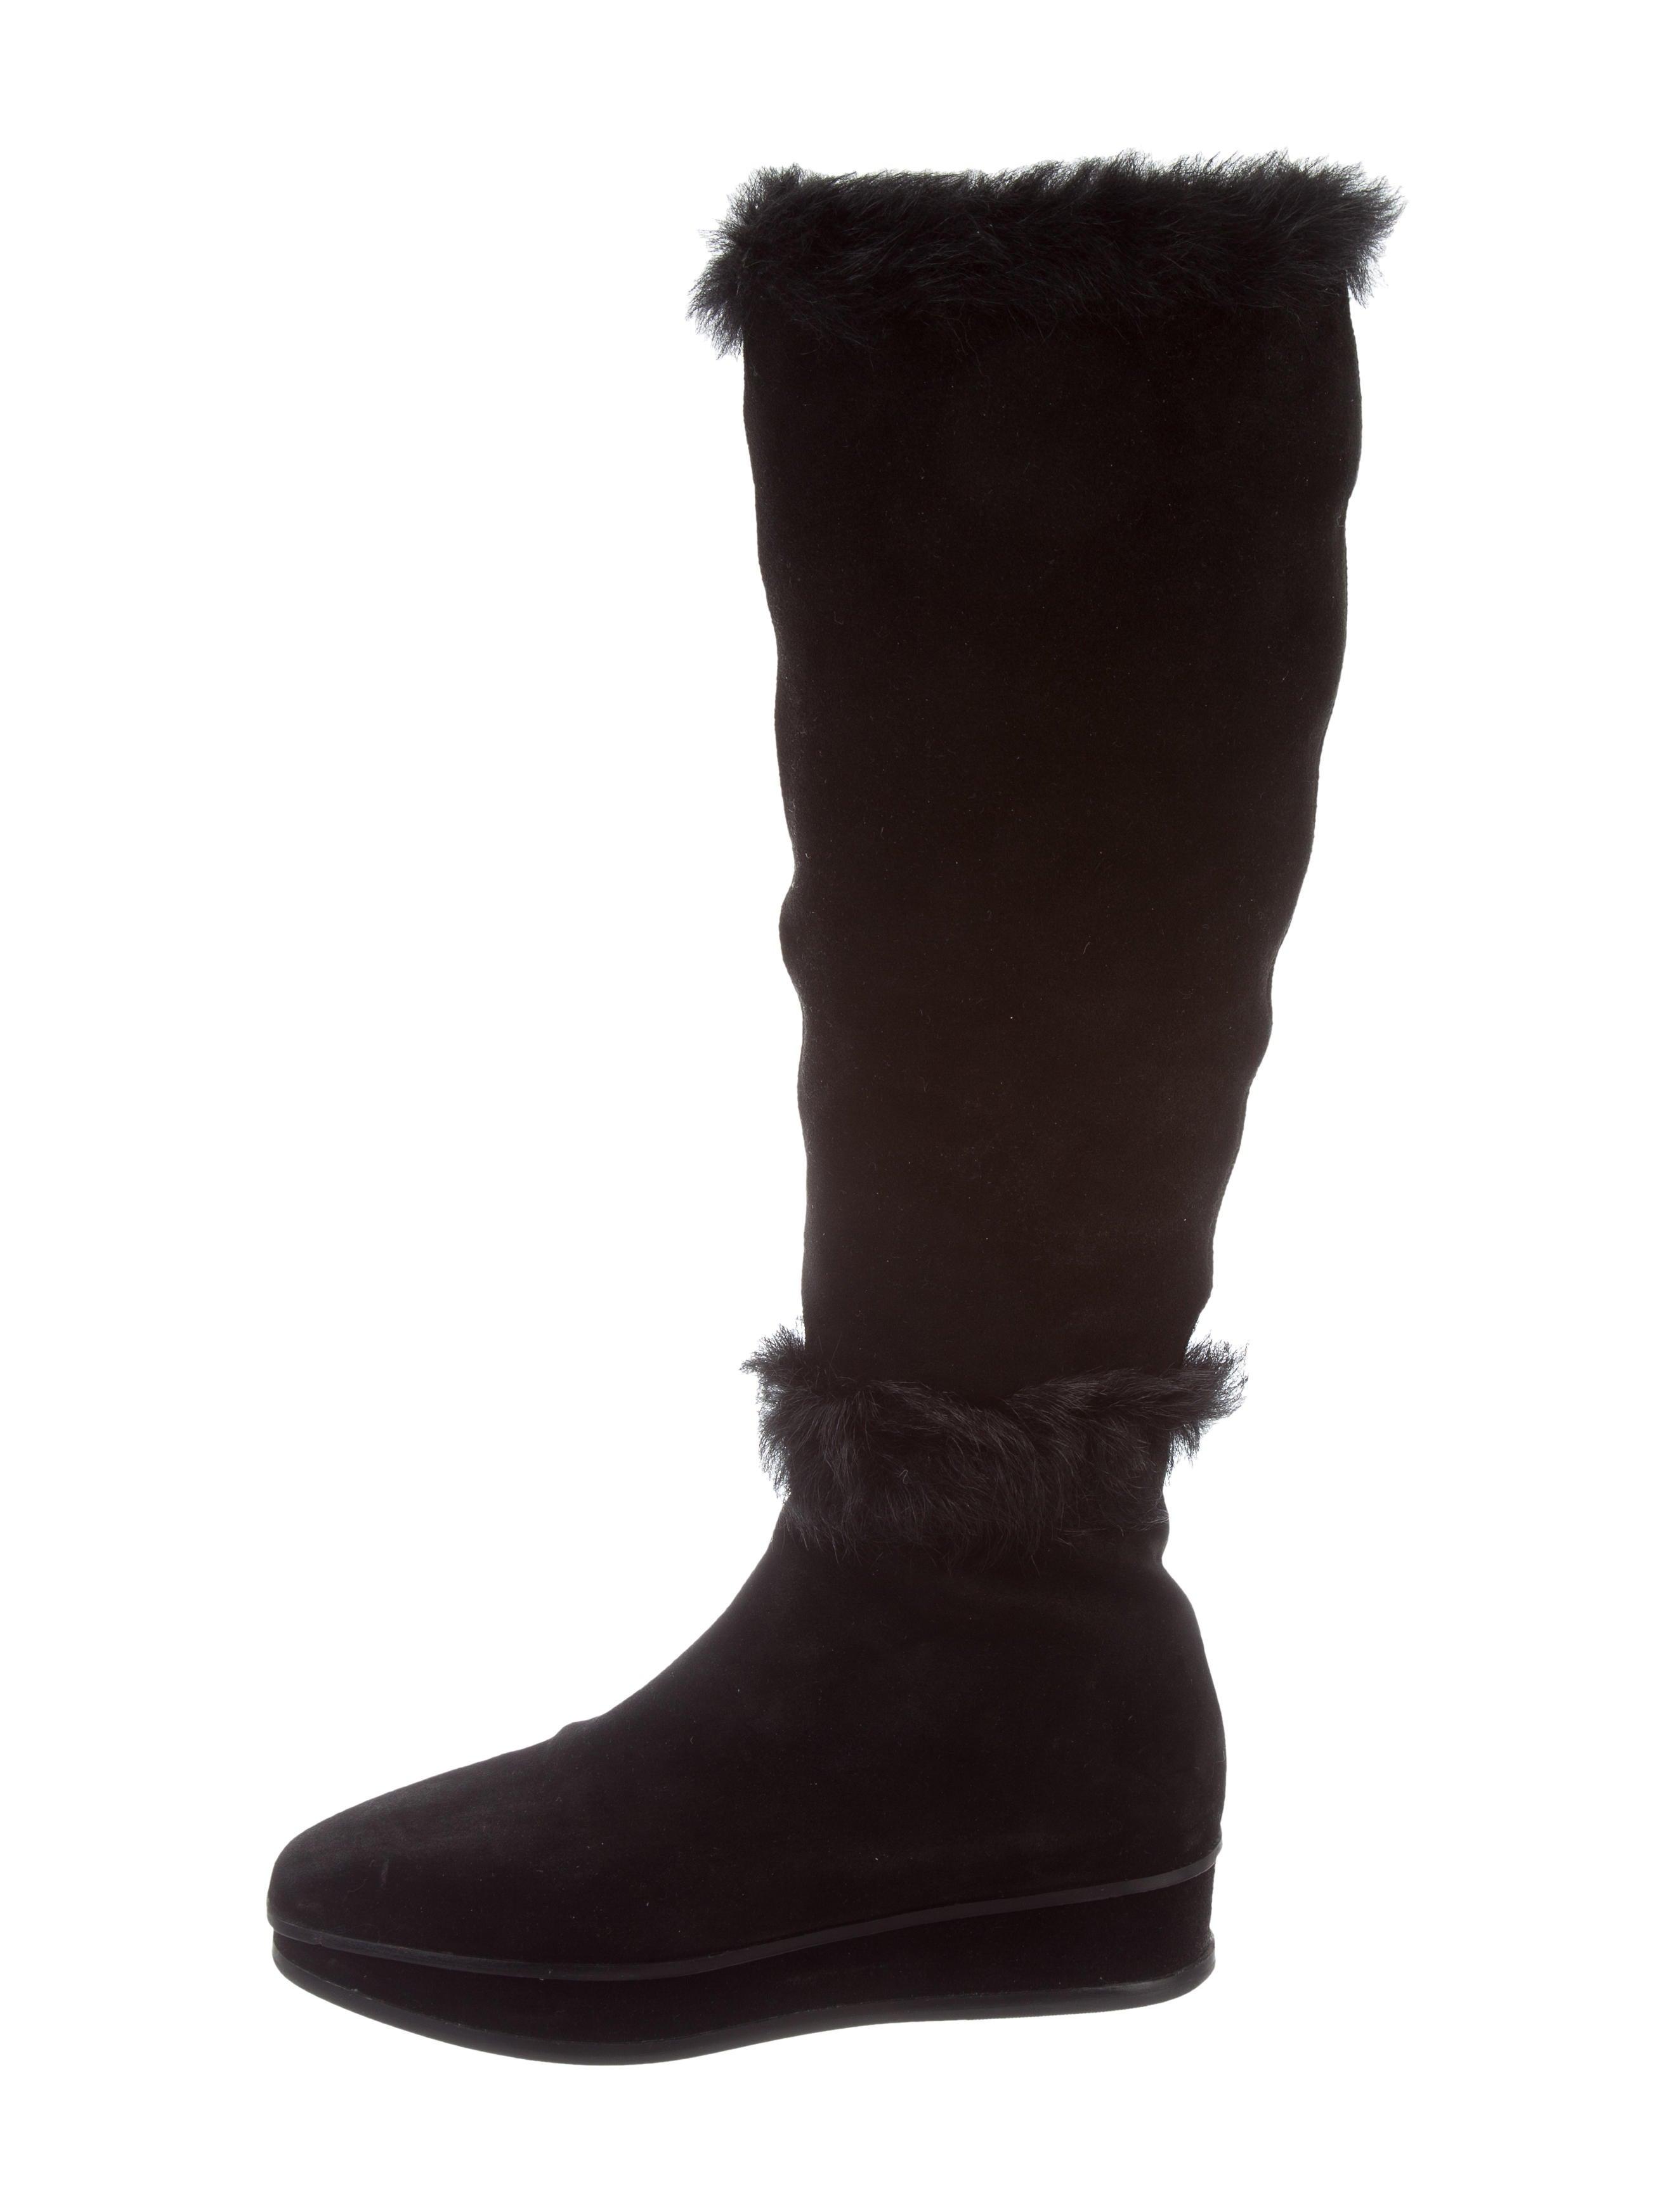 0e3d01da0 Tory Burch Marcel Knee-High Boots - Shoes - WTO121900